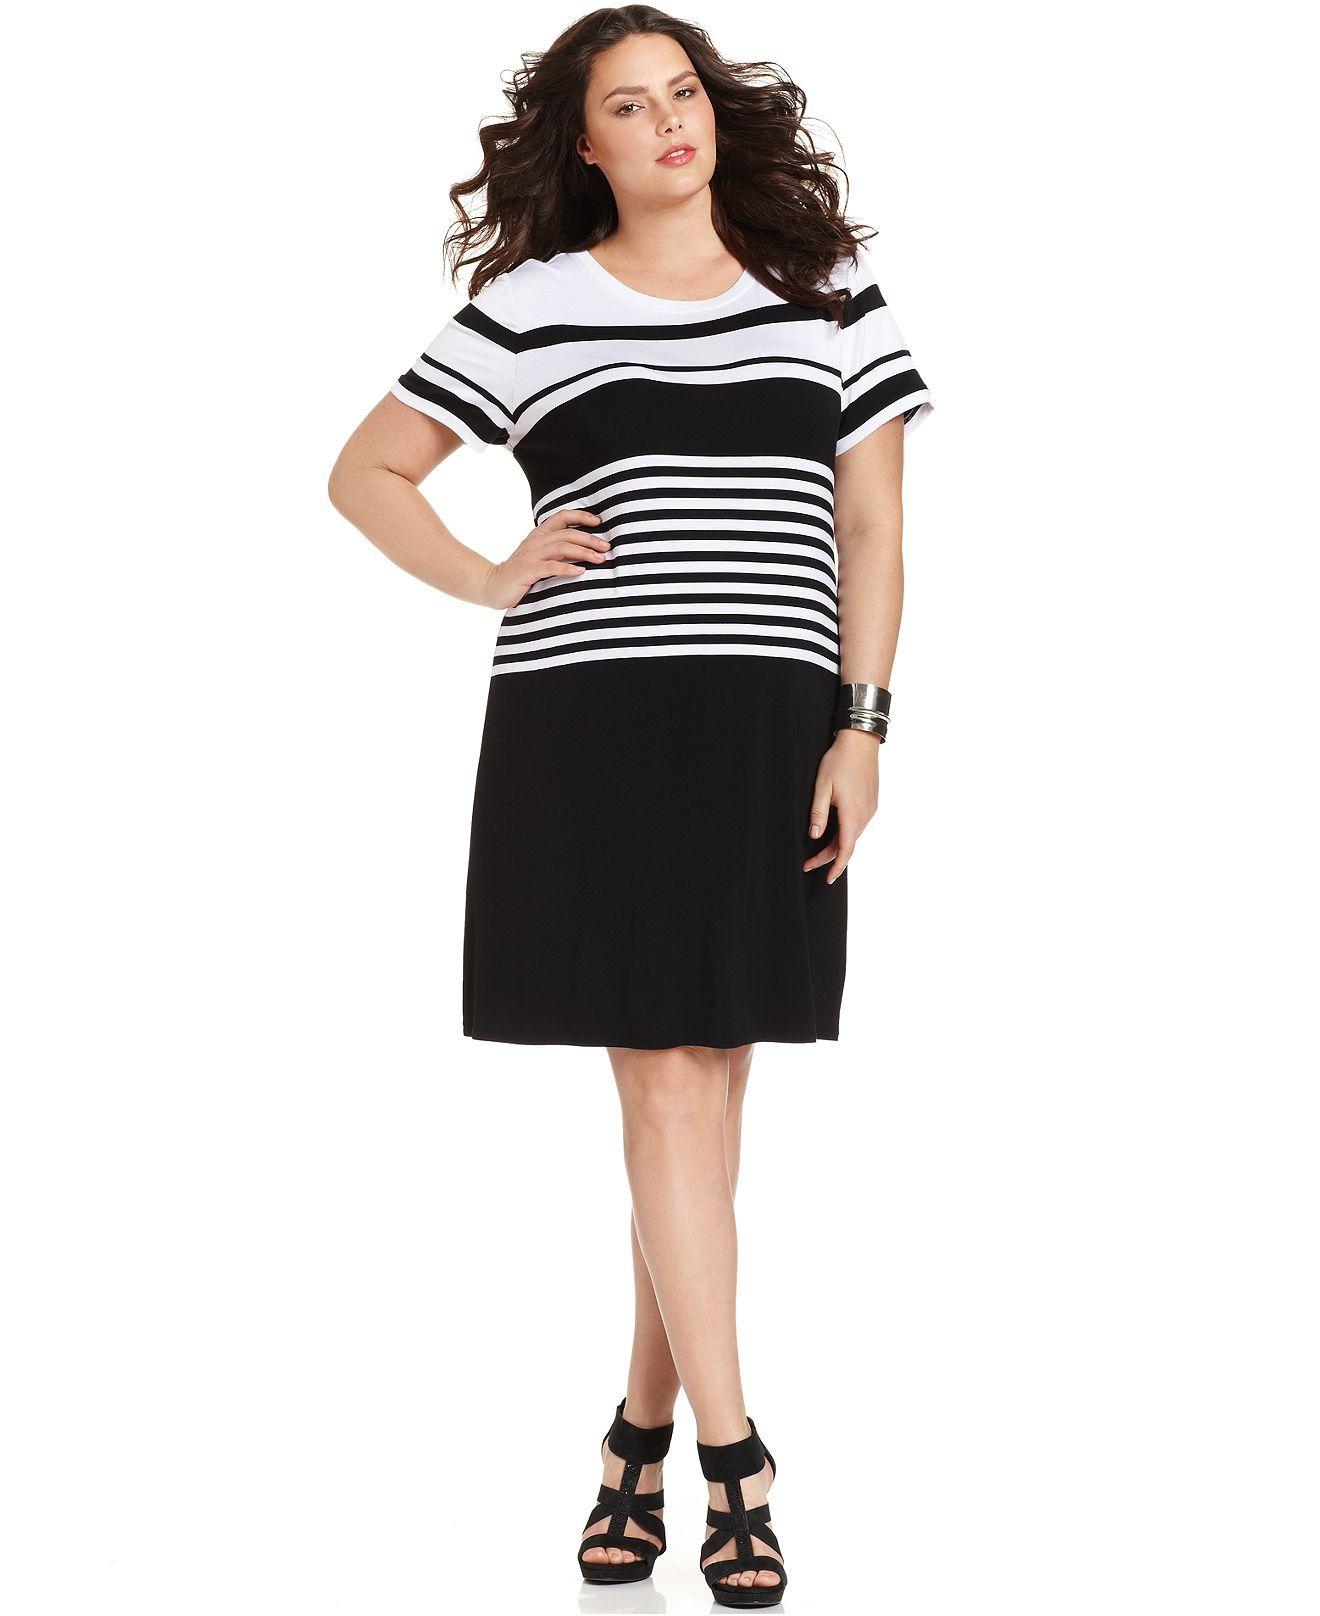 Calvin Klein Plus Size Dress, Short-Sleeve Striped - Plus Size ...